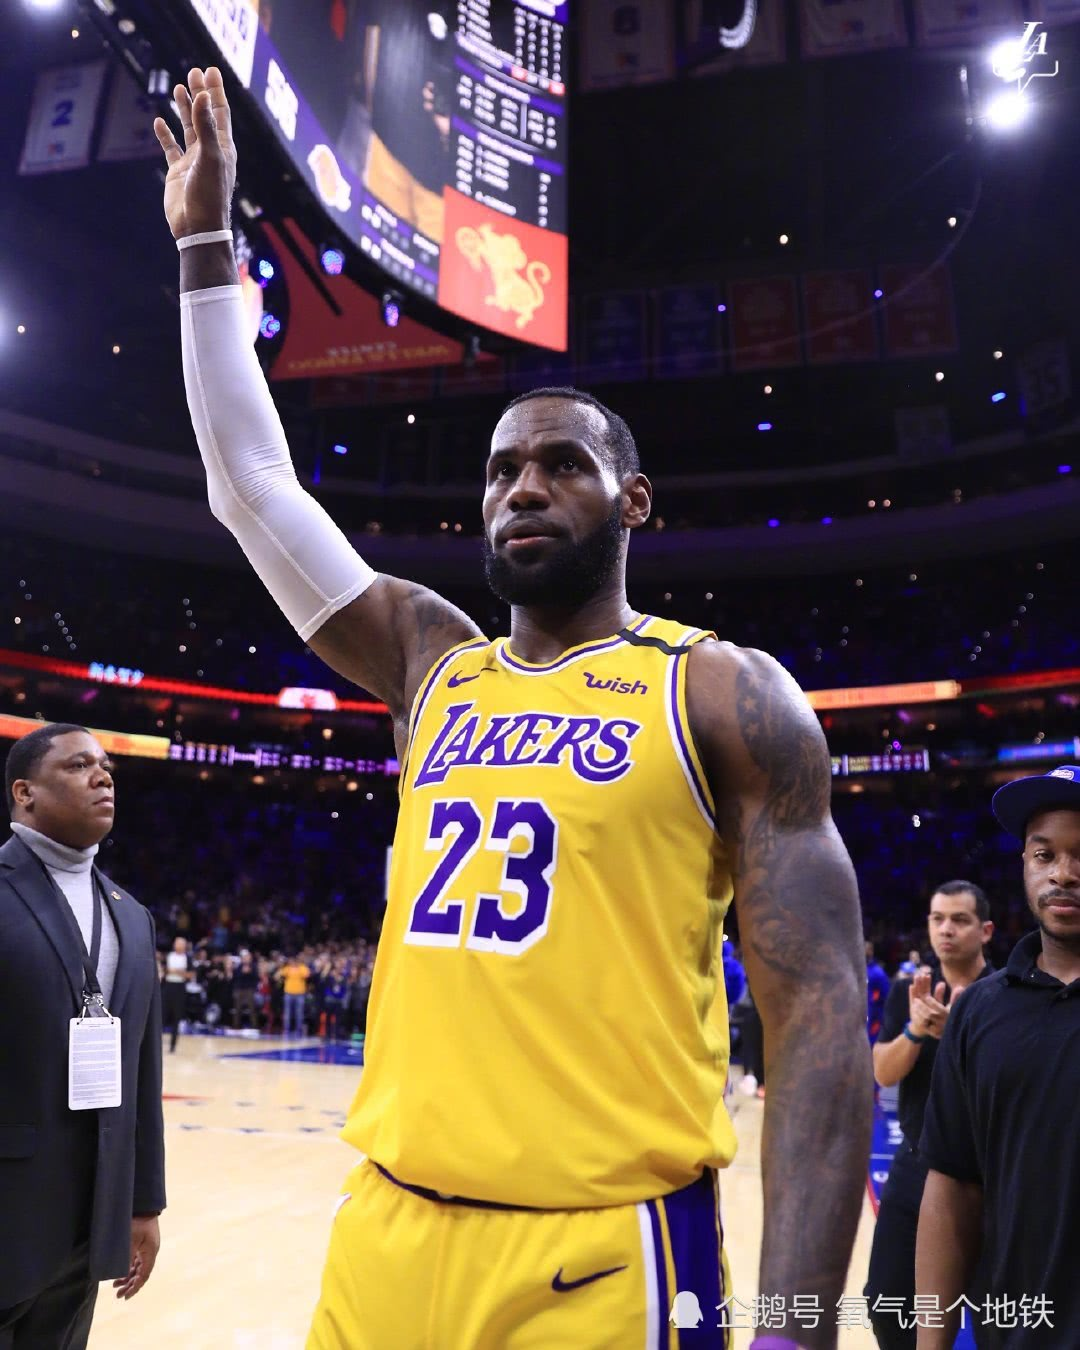 NBA没有成型的超巨组合大盘点:乔丹加盟湖人!詹姆斯科比组队!